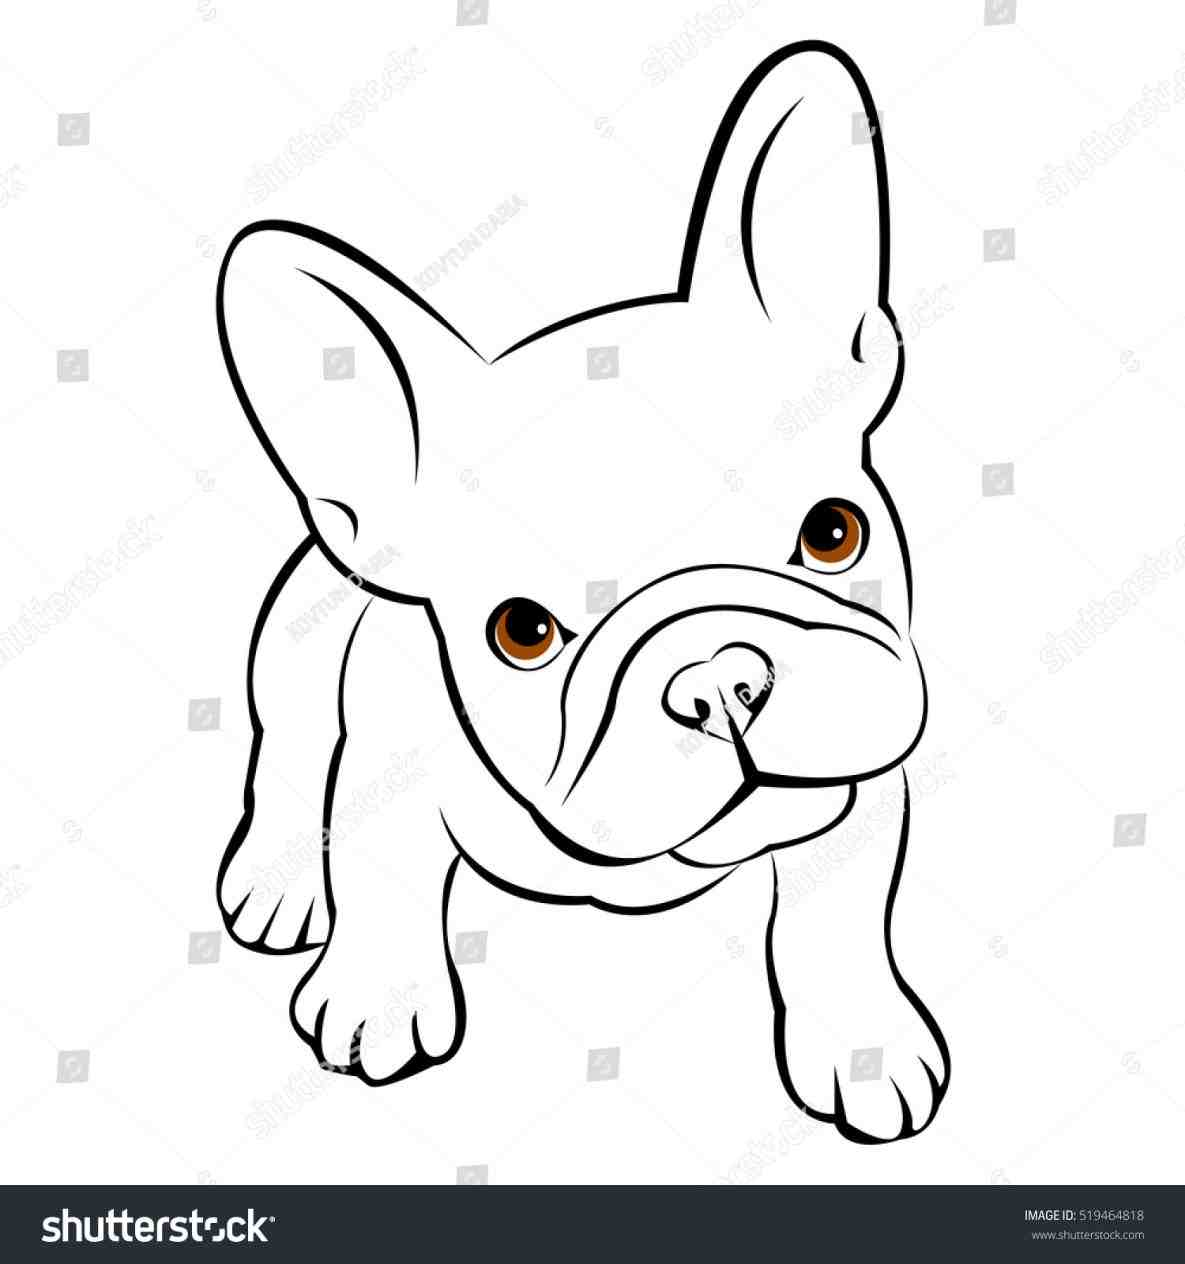 1185x1264 French Bulldogs Drawings